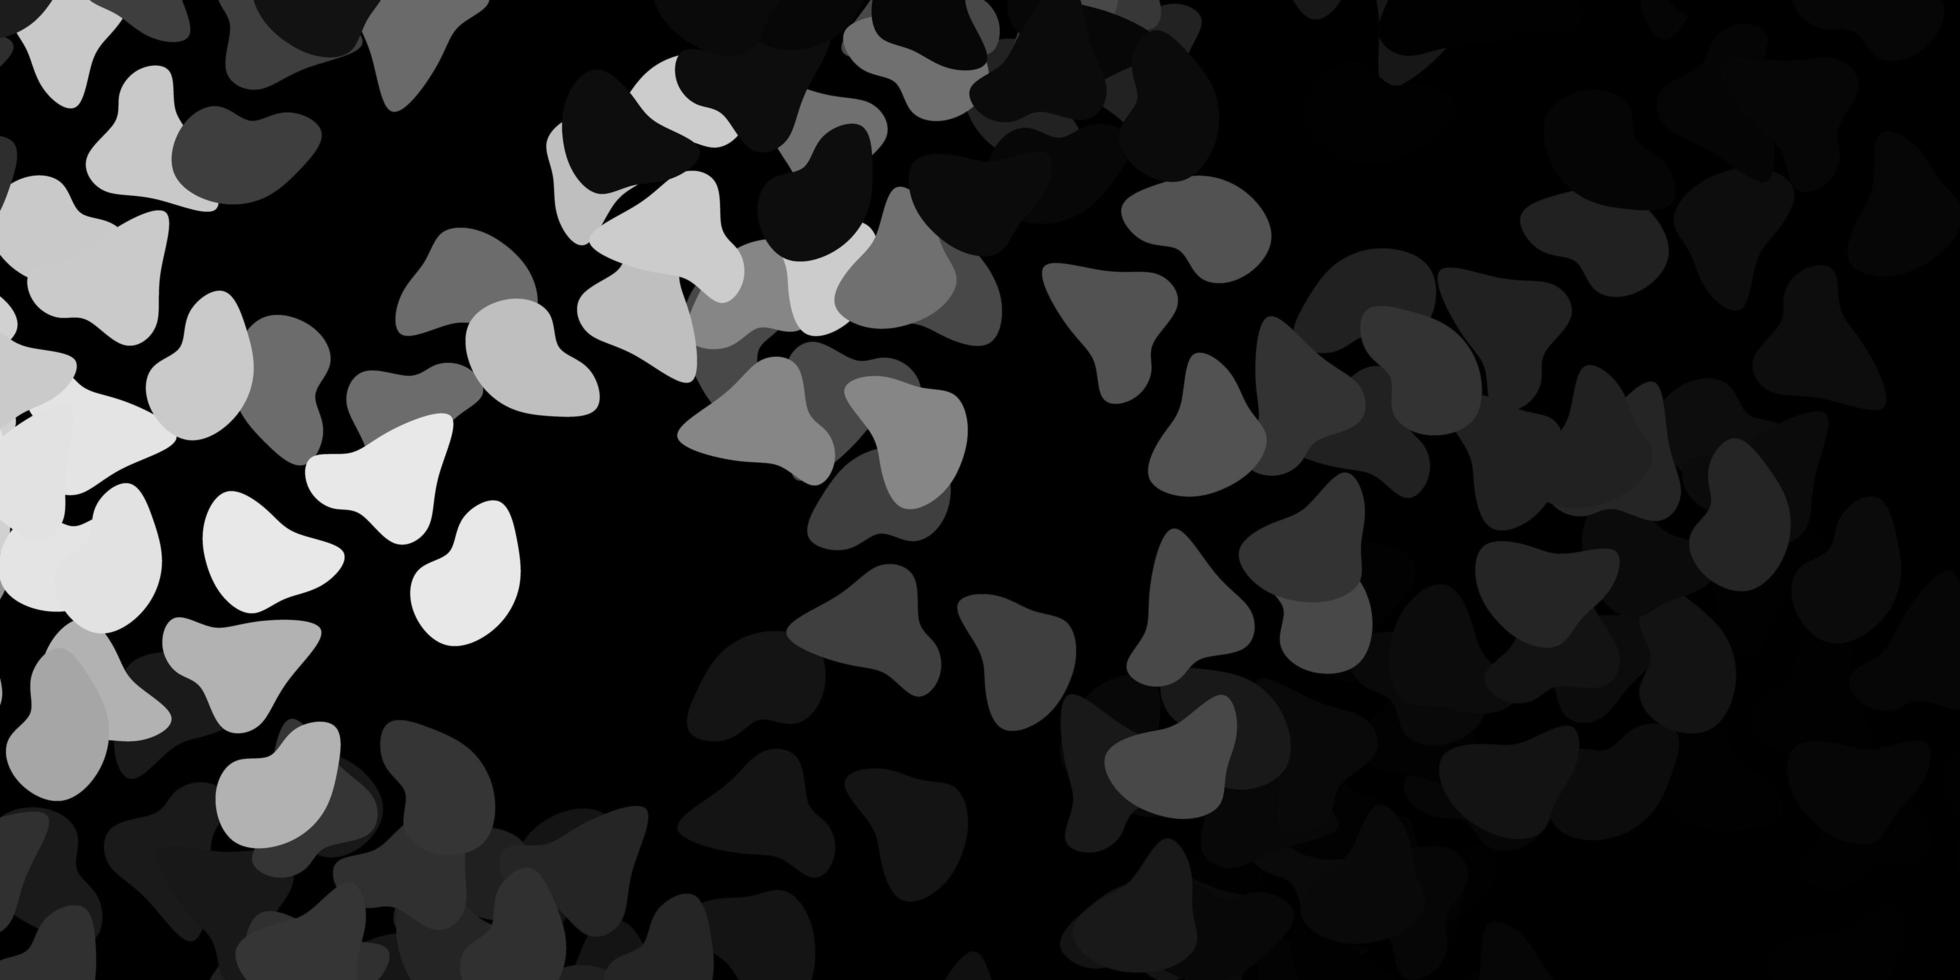 patrón de vector gris oscuro con formas abstractas.